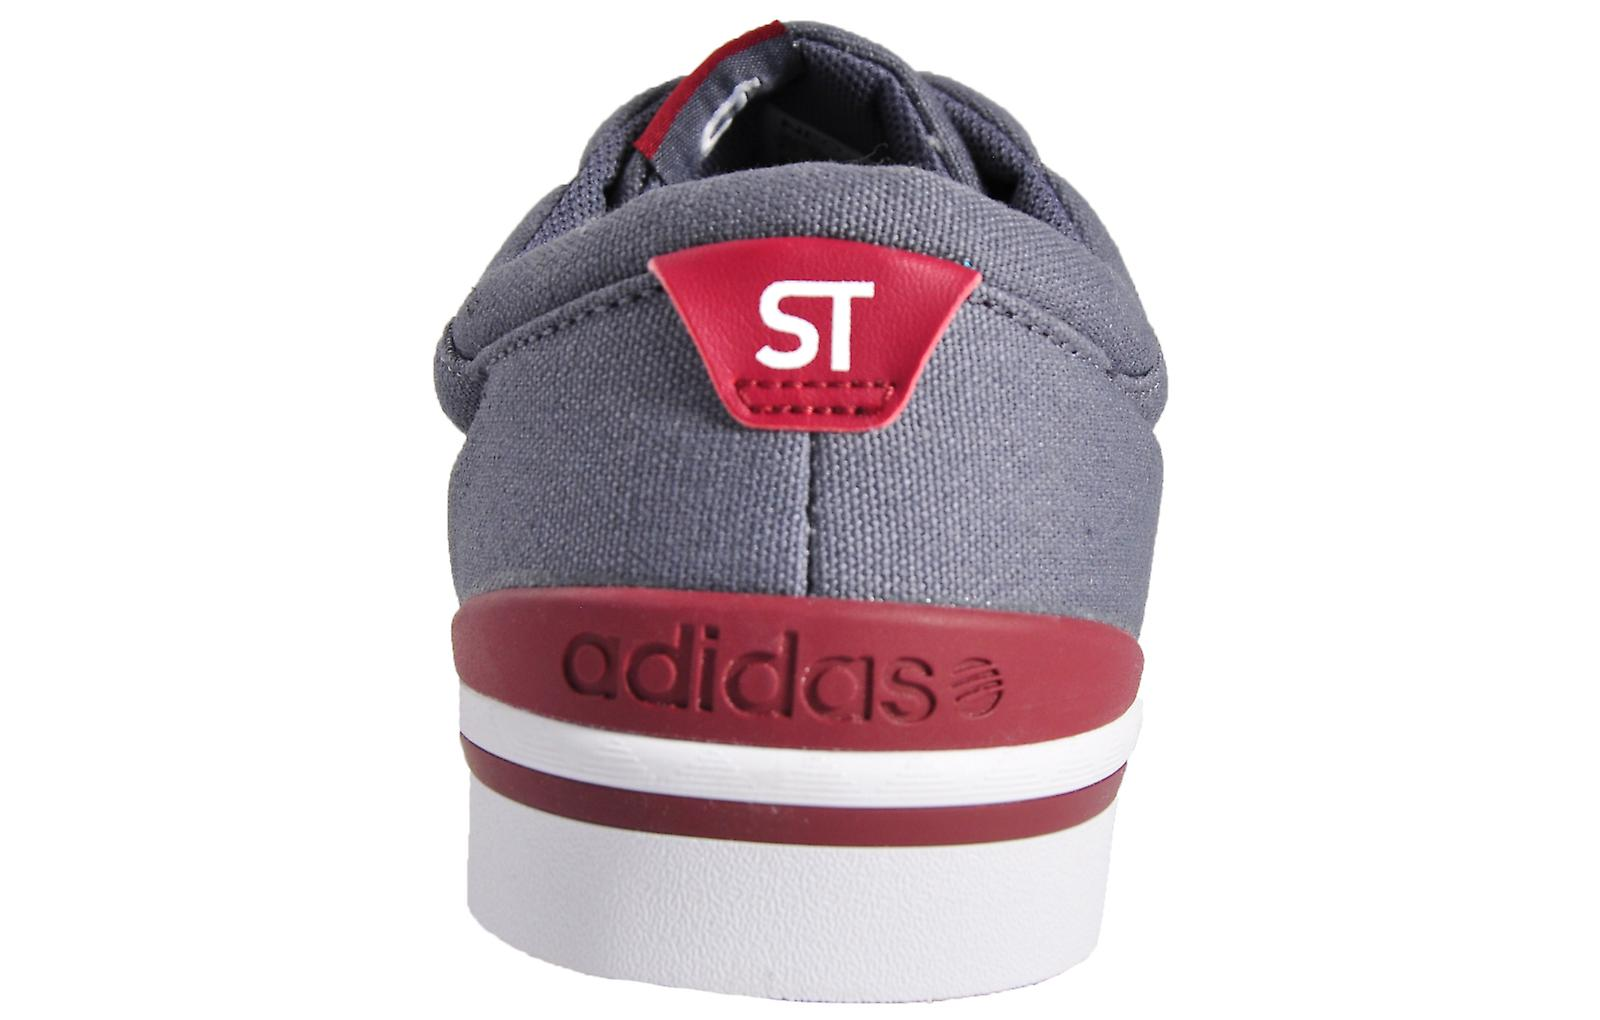 Adidas Park ST Classic Grey / White / Burgundy